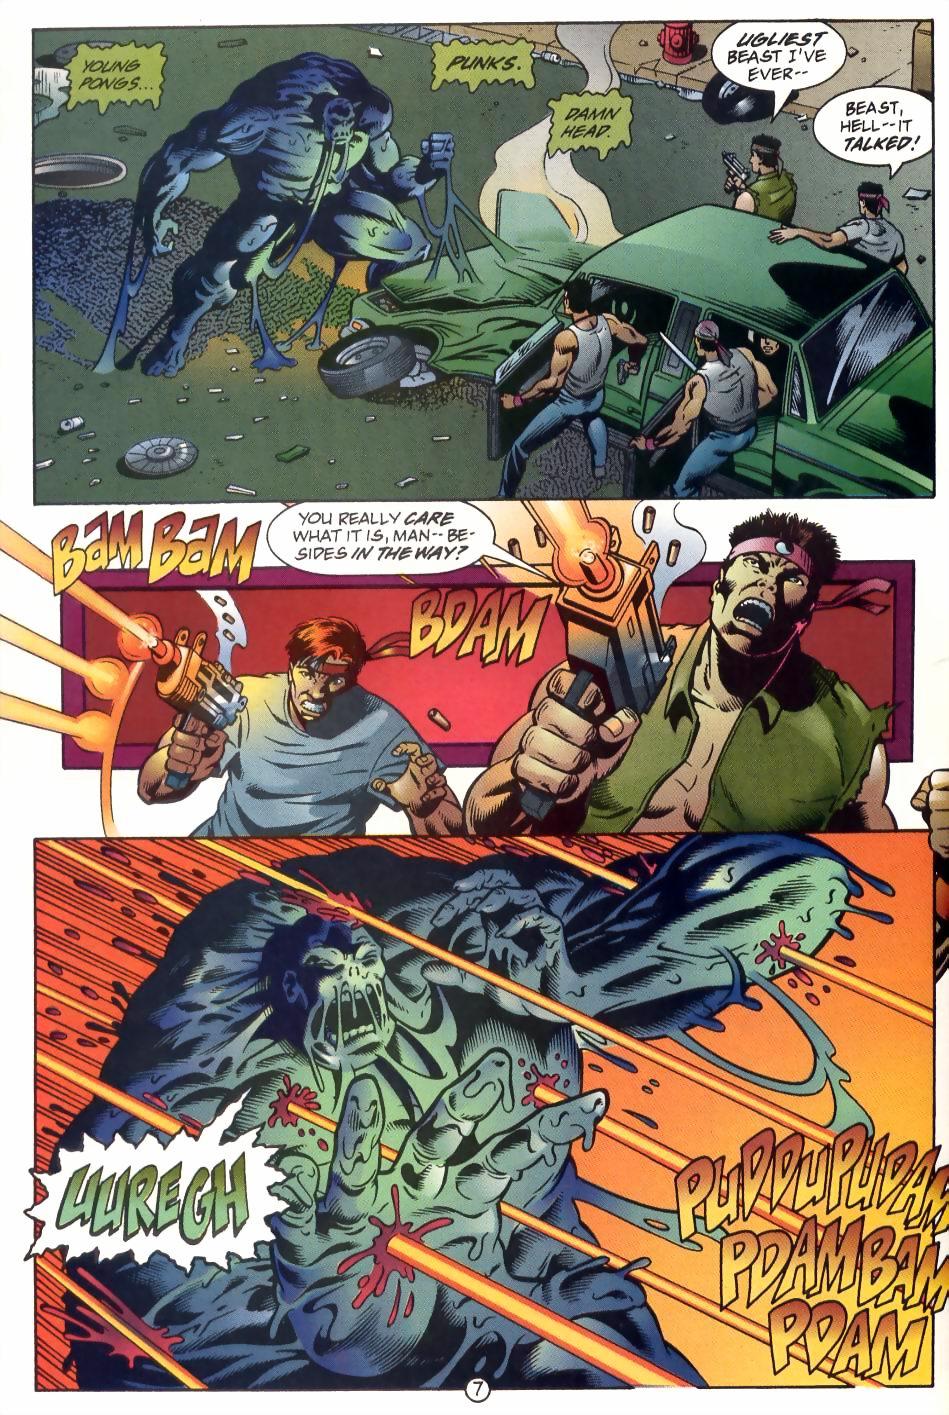 Read online Sludge comic -  Issue #1 - 8